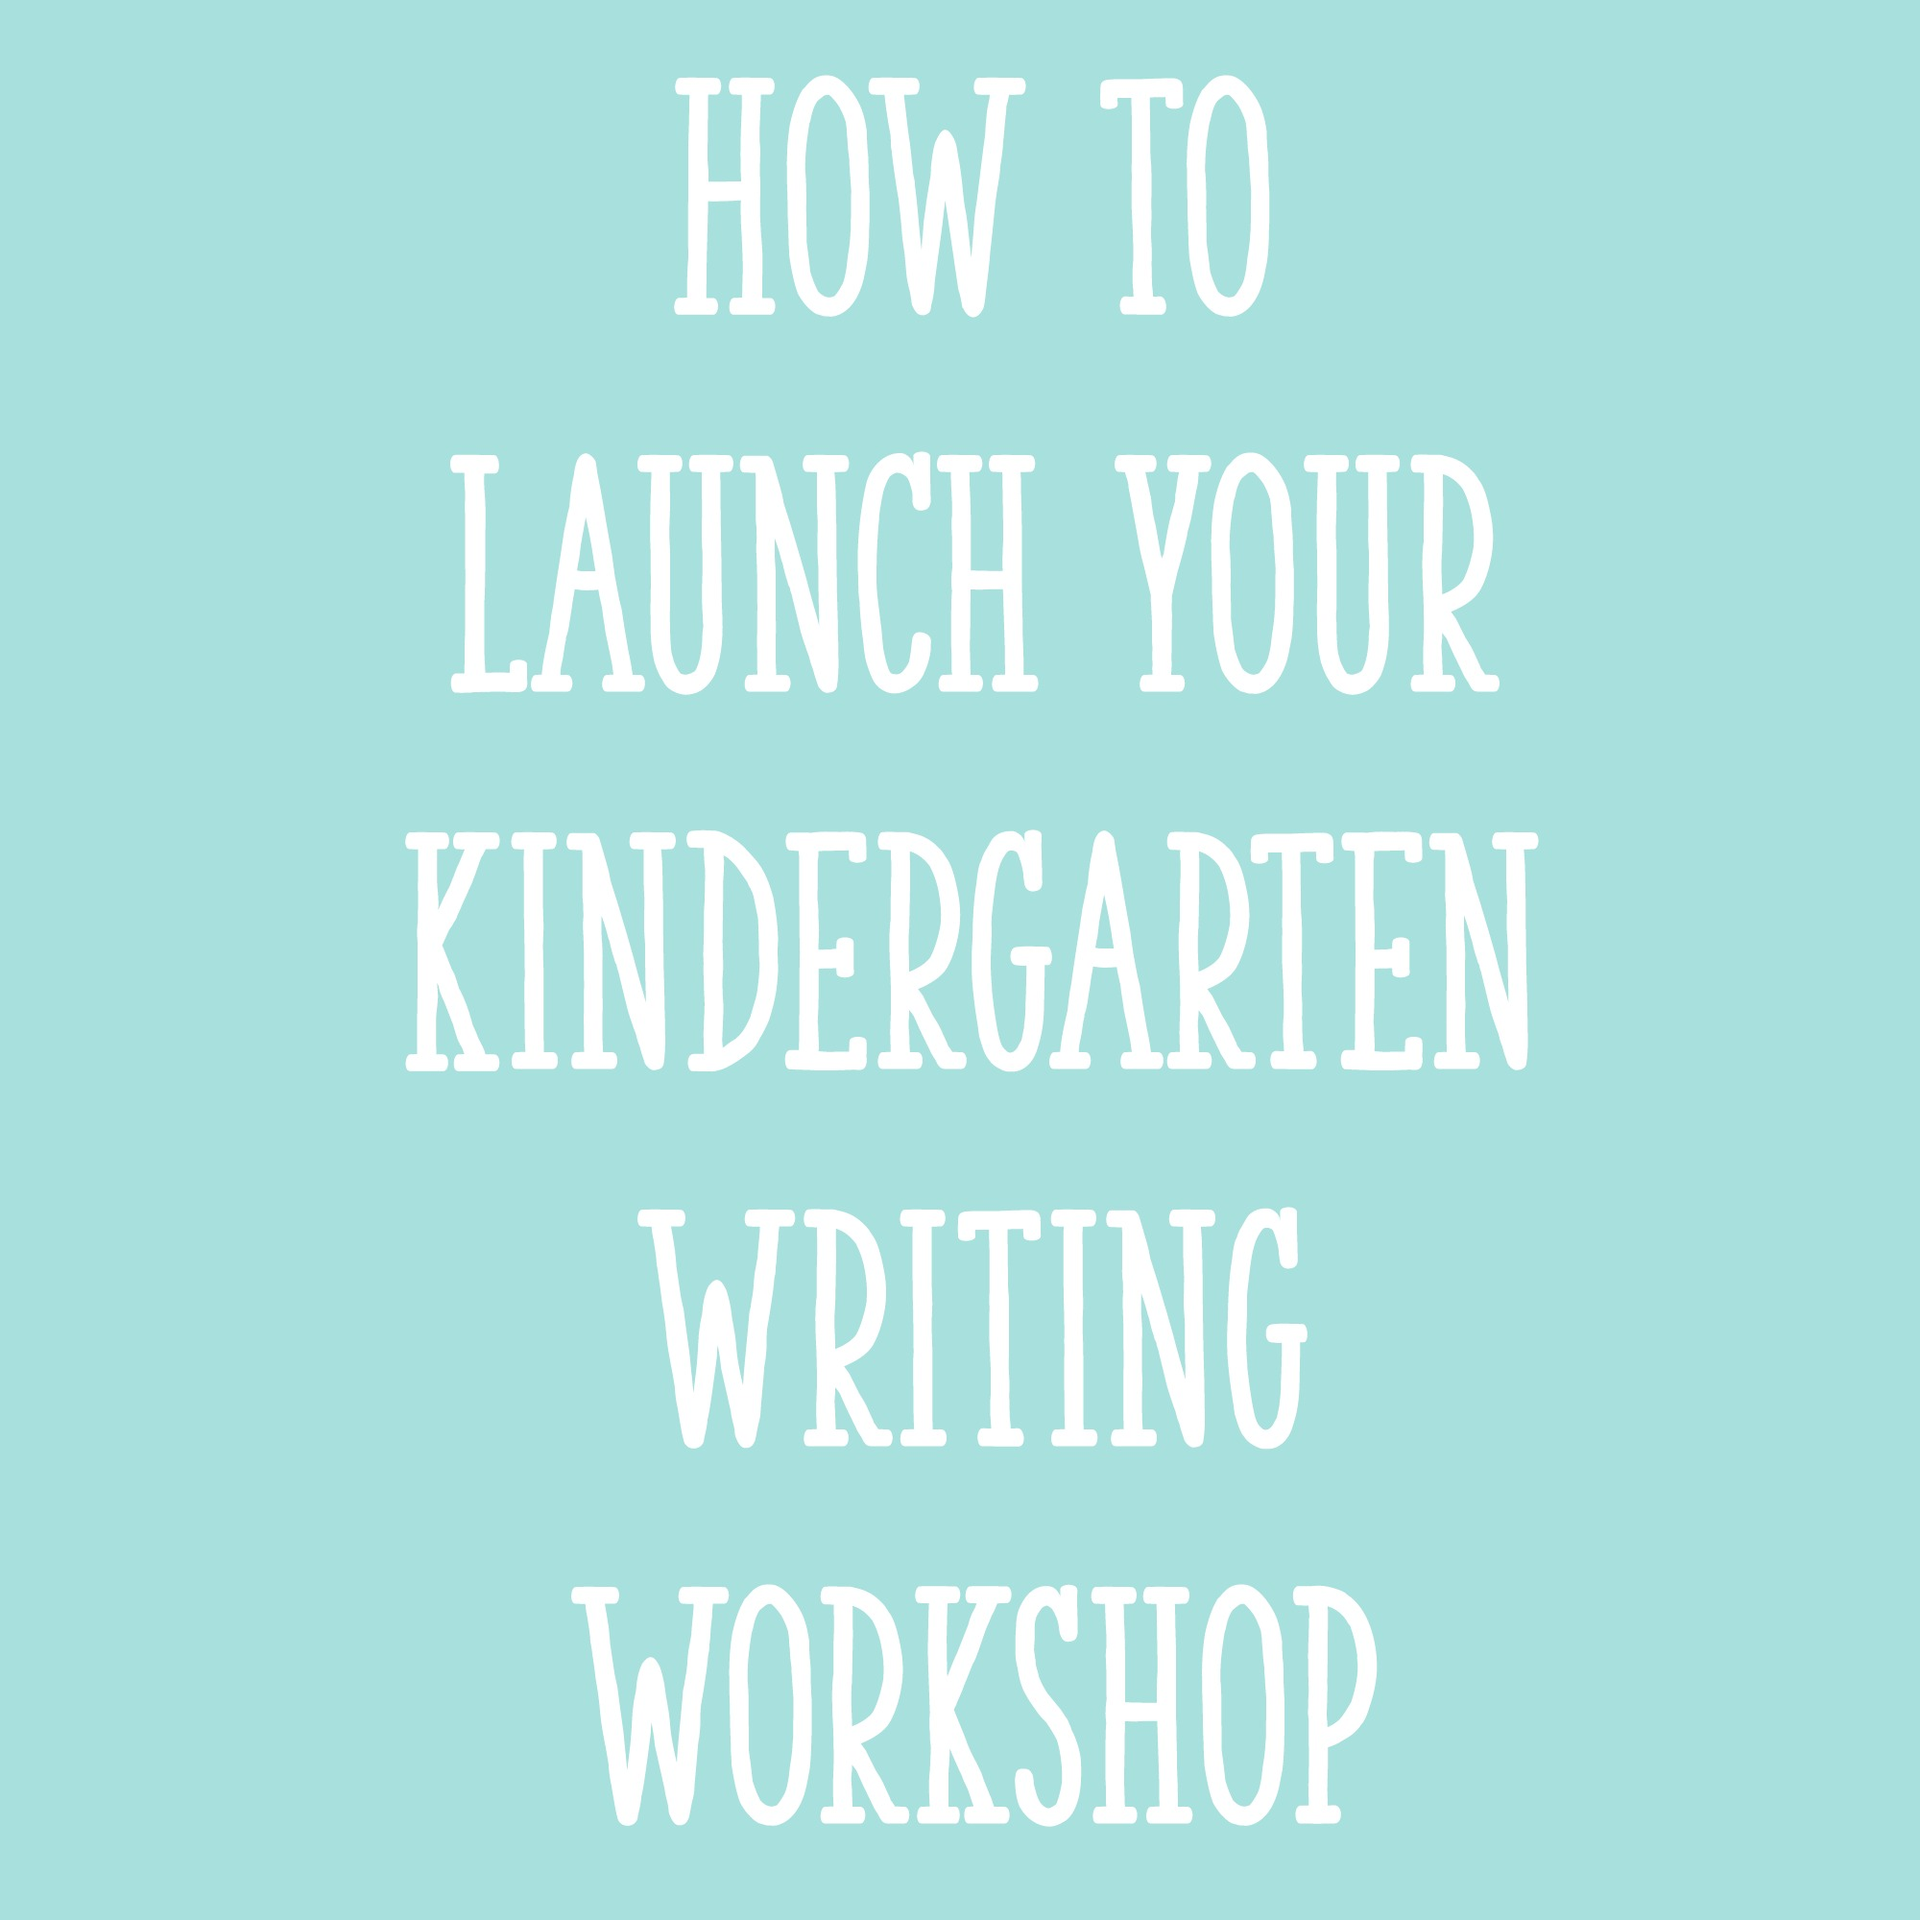 How to Launch Your Kindergarten Writing Workshop Title - Kindergarten Writing Workshops